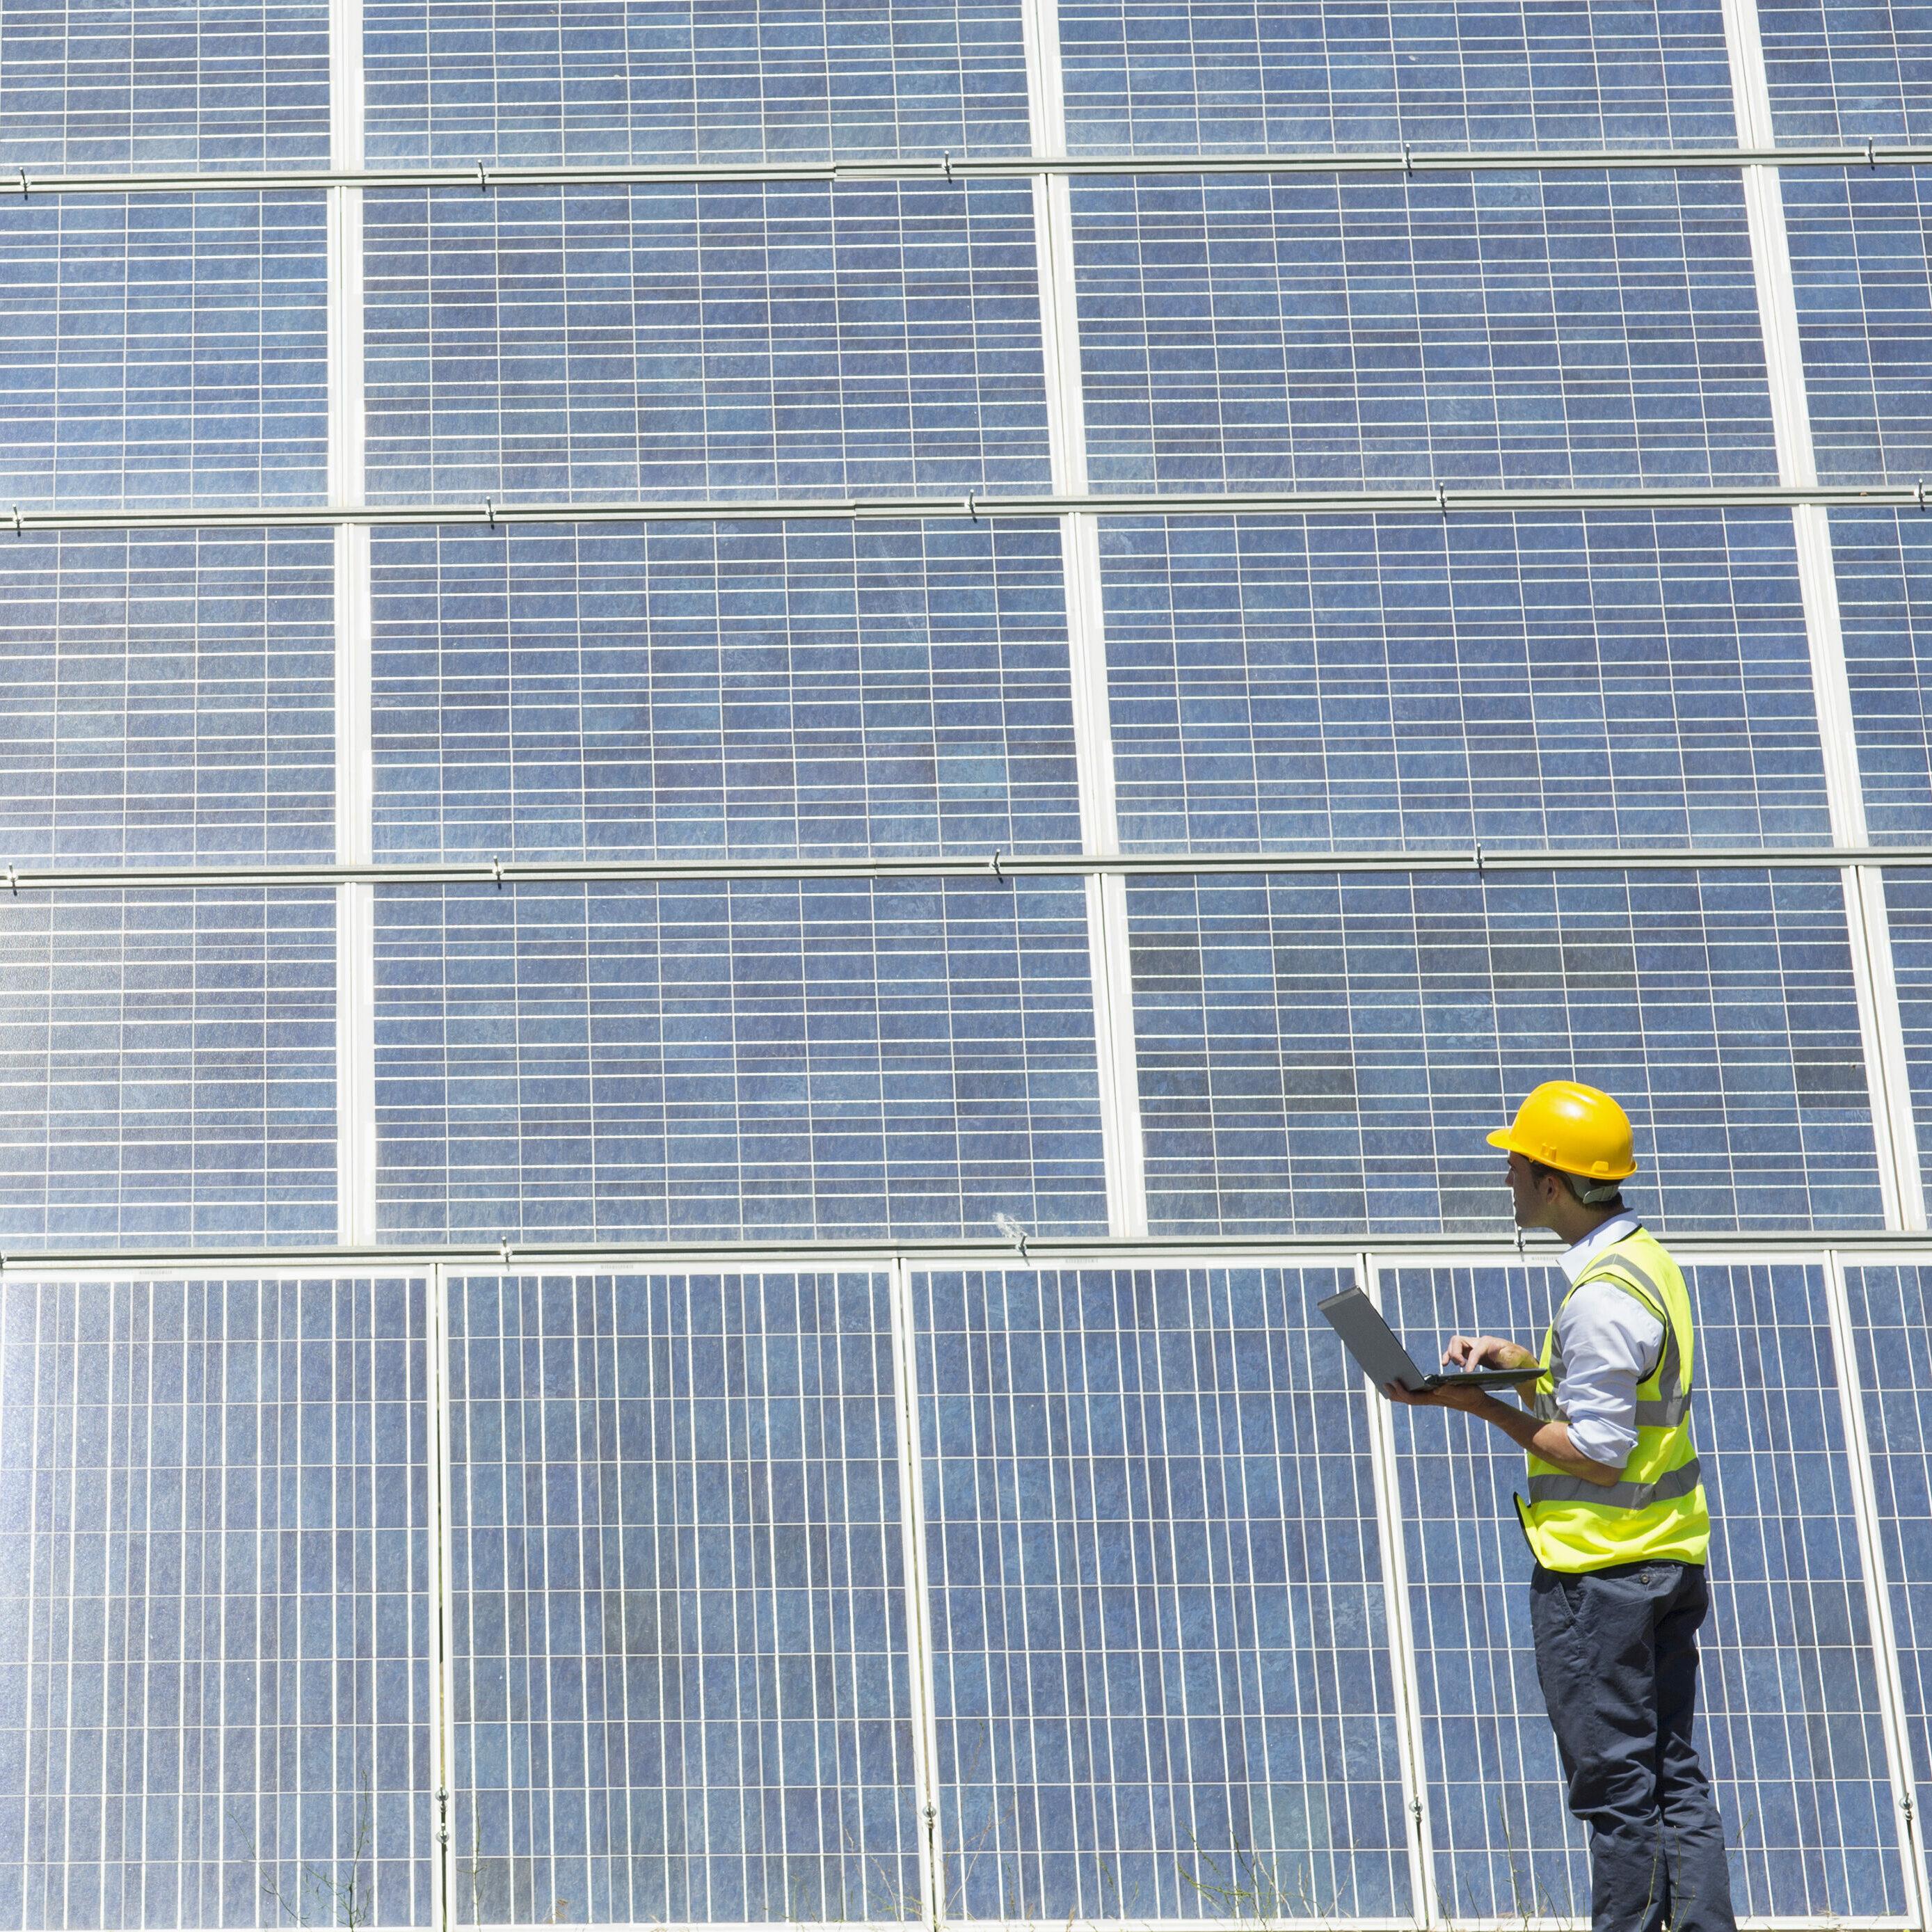 Engineer with laptop examining sunny solar panels